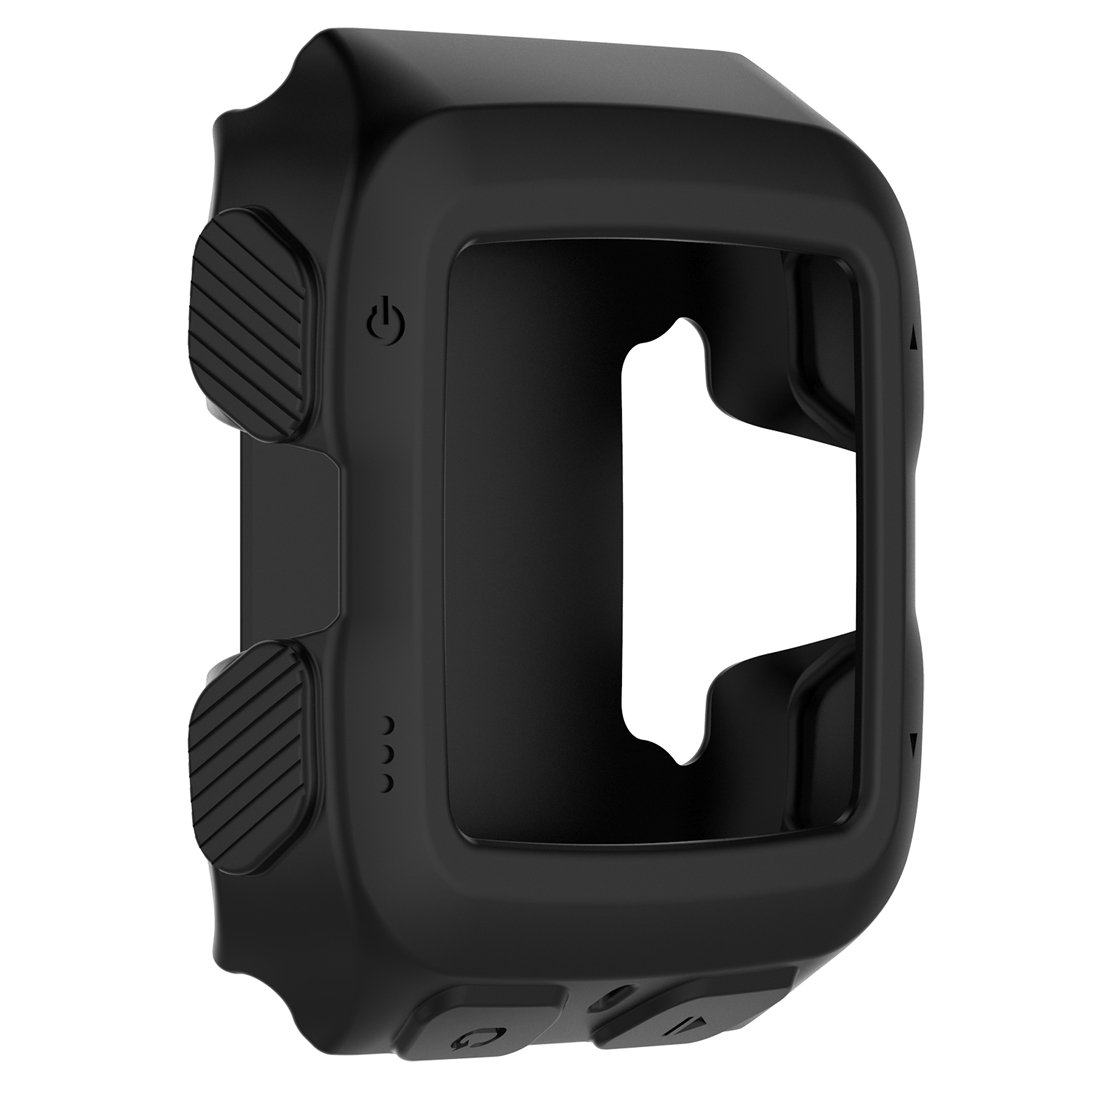 Funda Protectora Para Reloj Garmin Forerunner 920xt negro